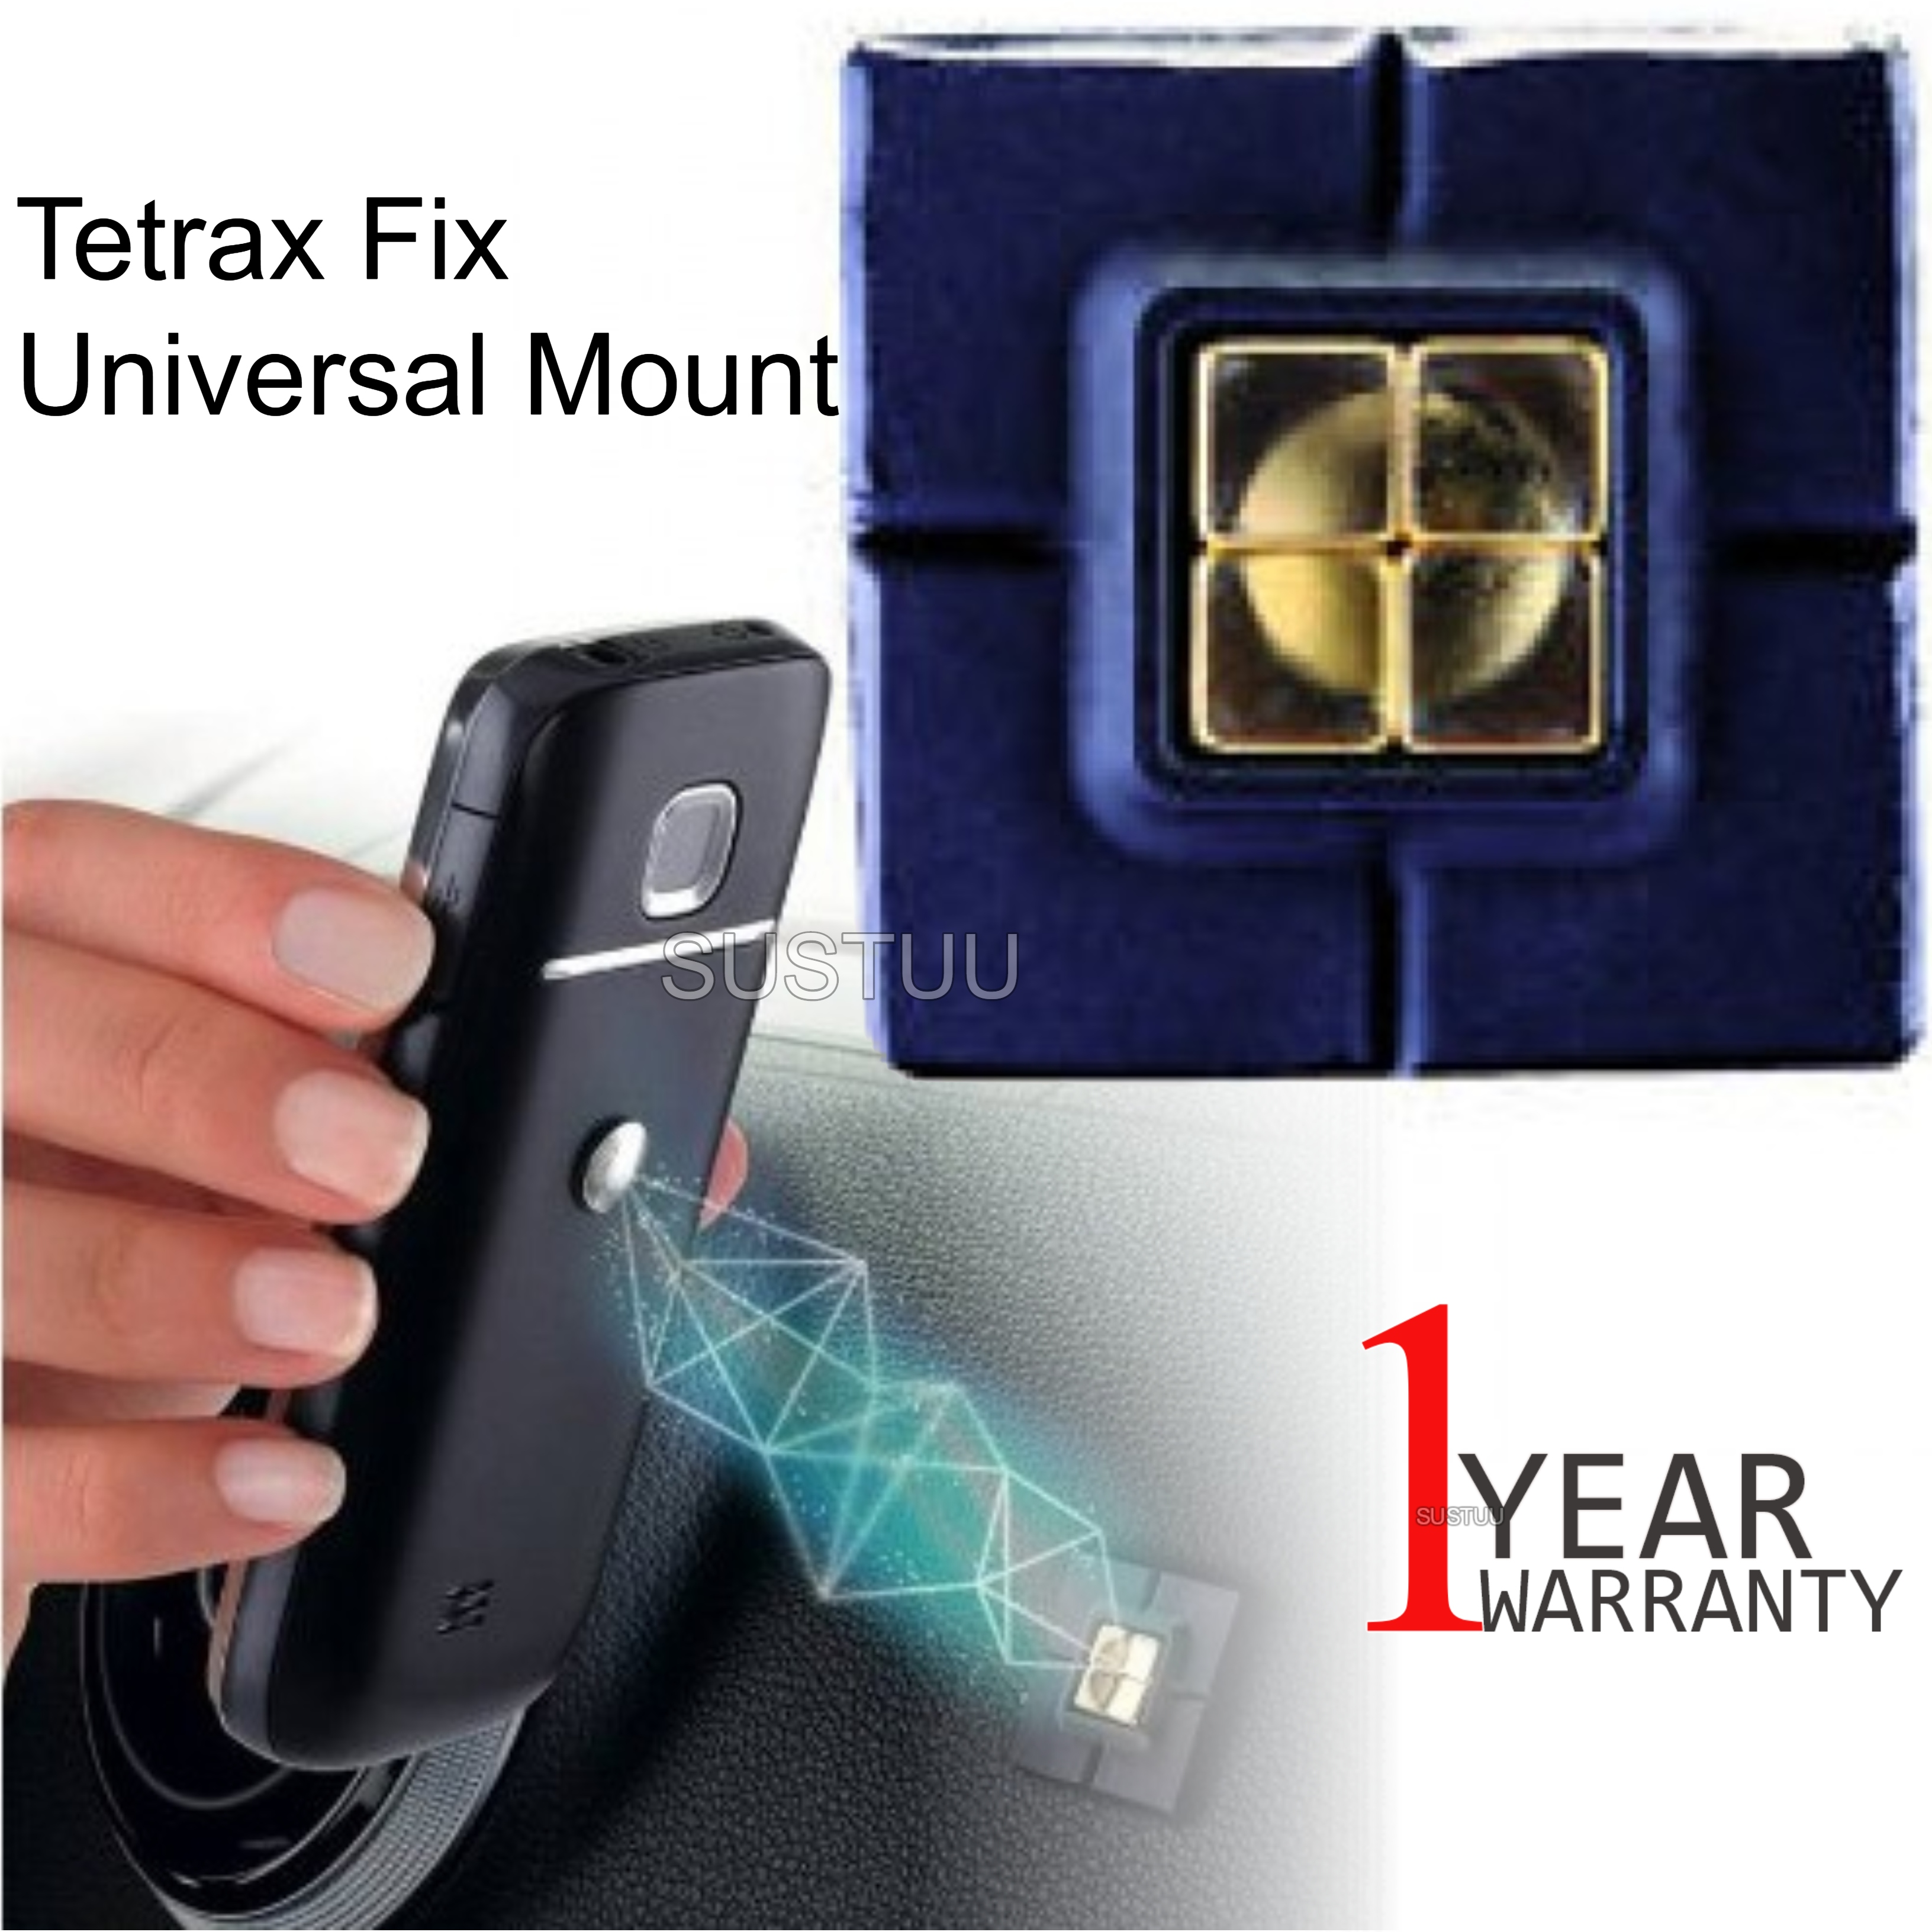 Tetrax Fix Magnetic Car Dash Holder | Universal Mobile Mount | For iPhone-GPS/SatNav